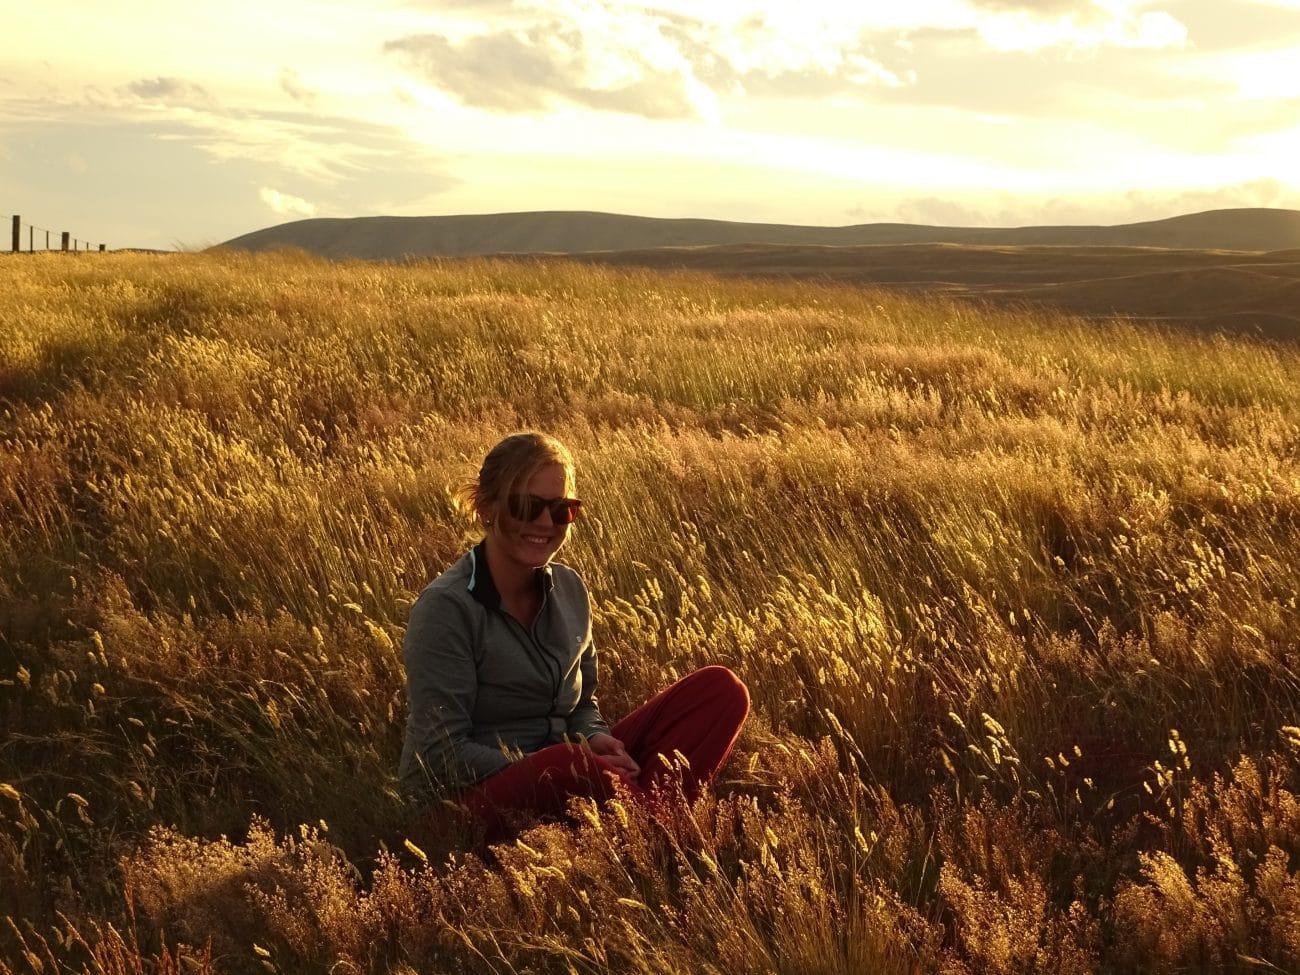 Das PASSENGER X Sabbatical Interview mit Magdalena_Neuseeland